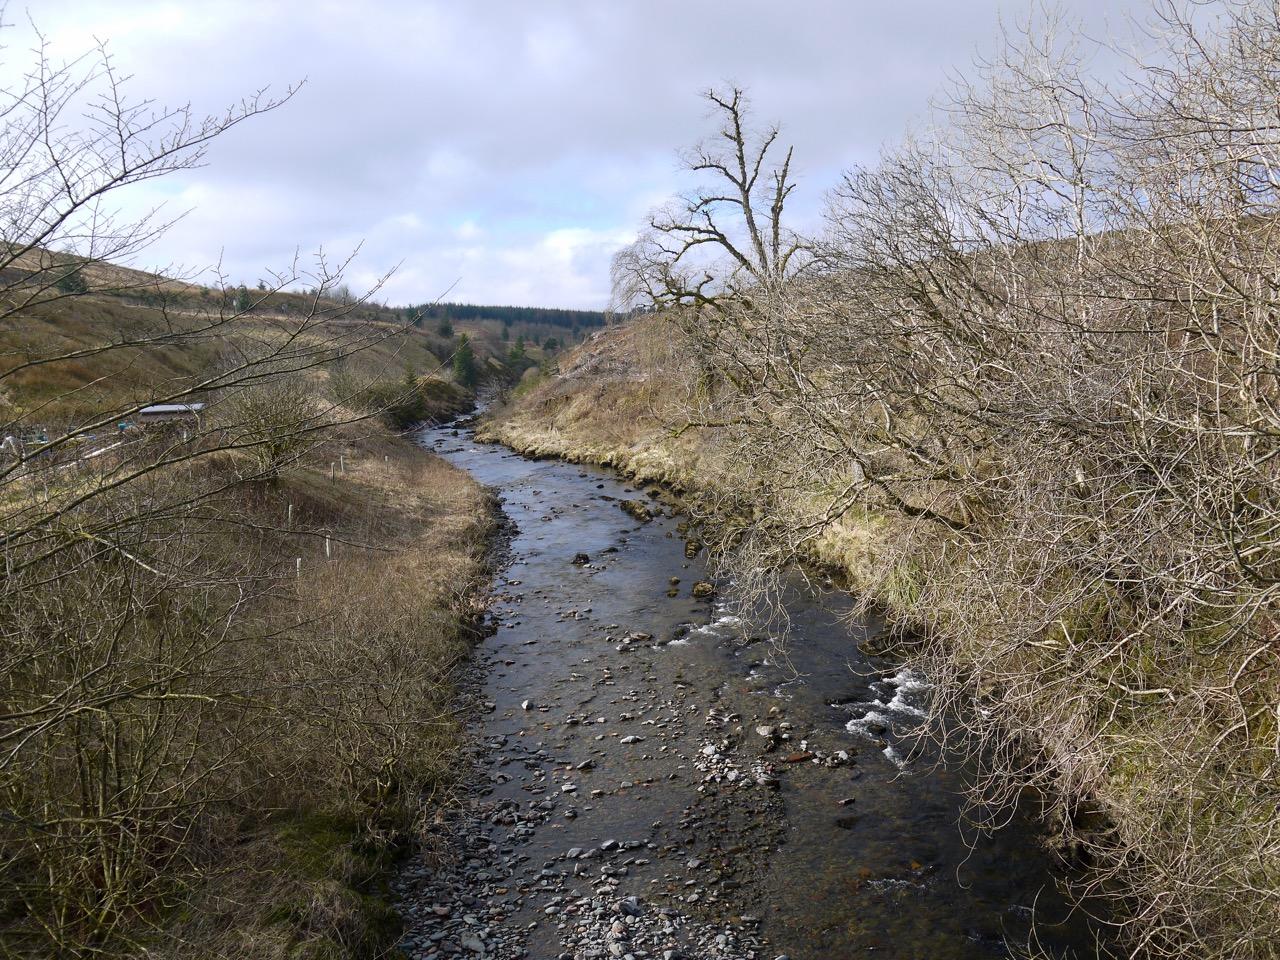 Garwaldwater